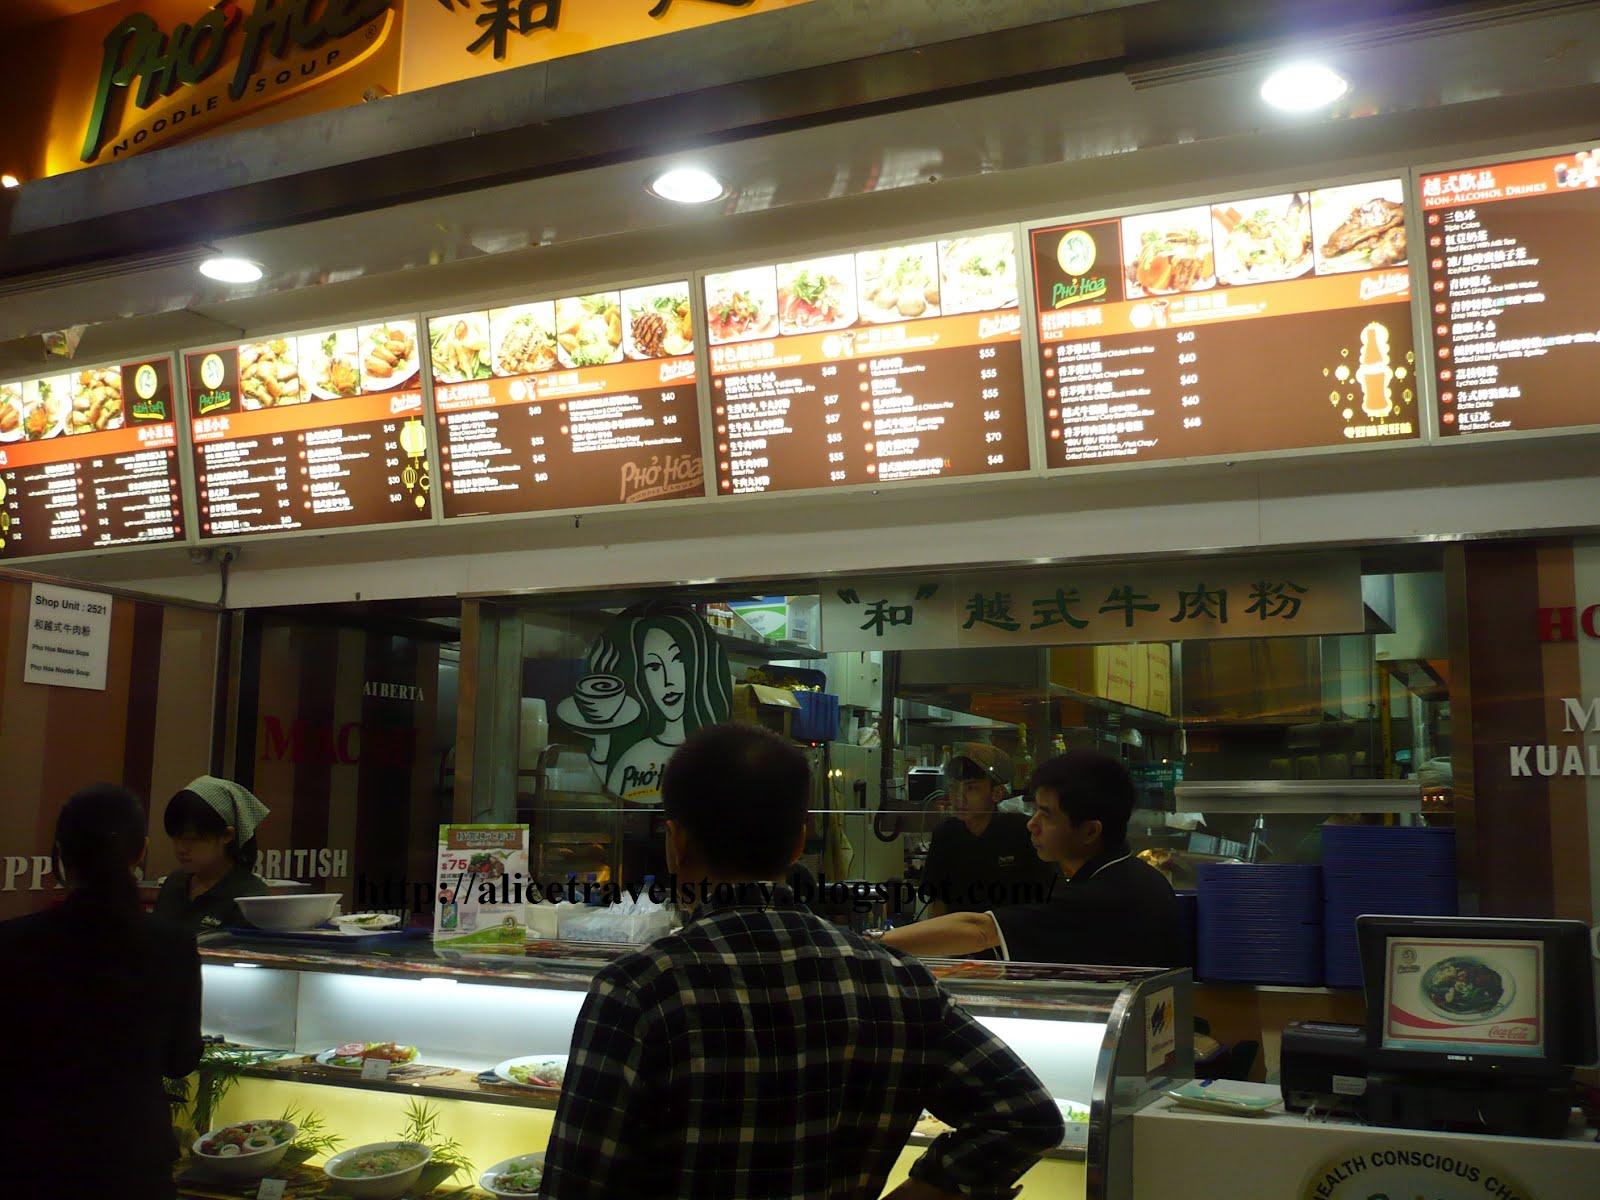 Venetian Hotel Food Court Macau